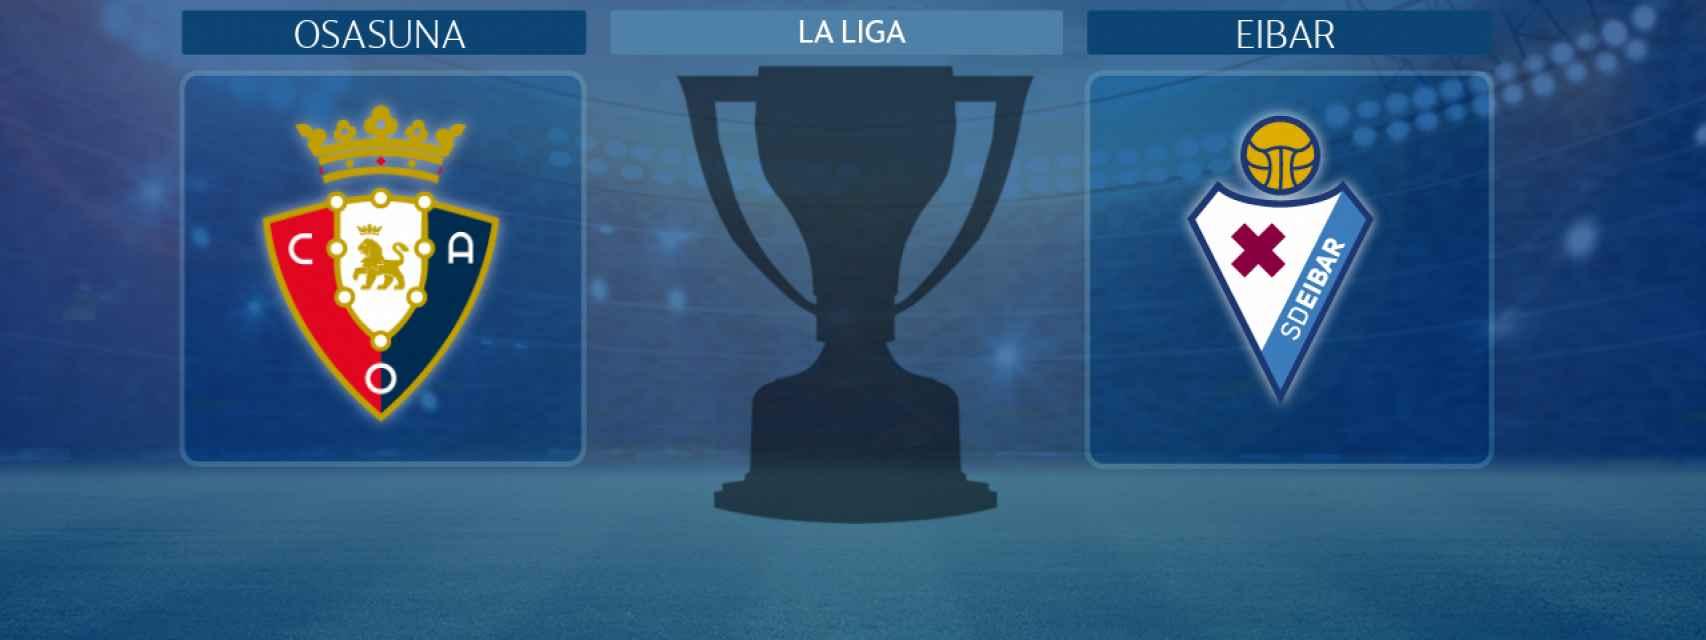 Osasuna - Eibar, partido de La Liga